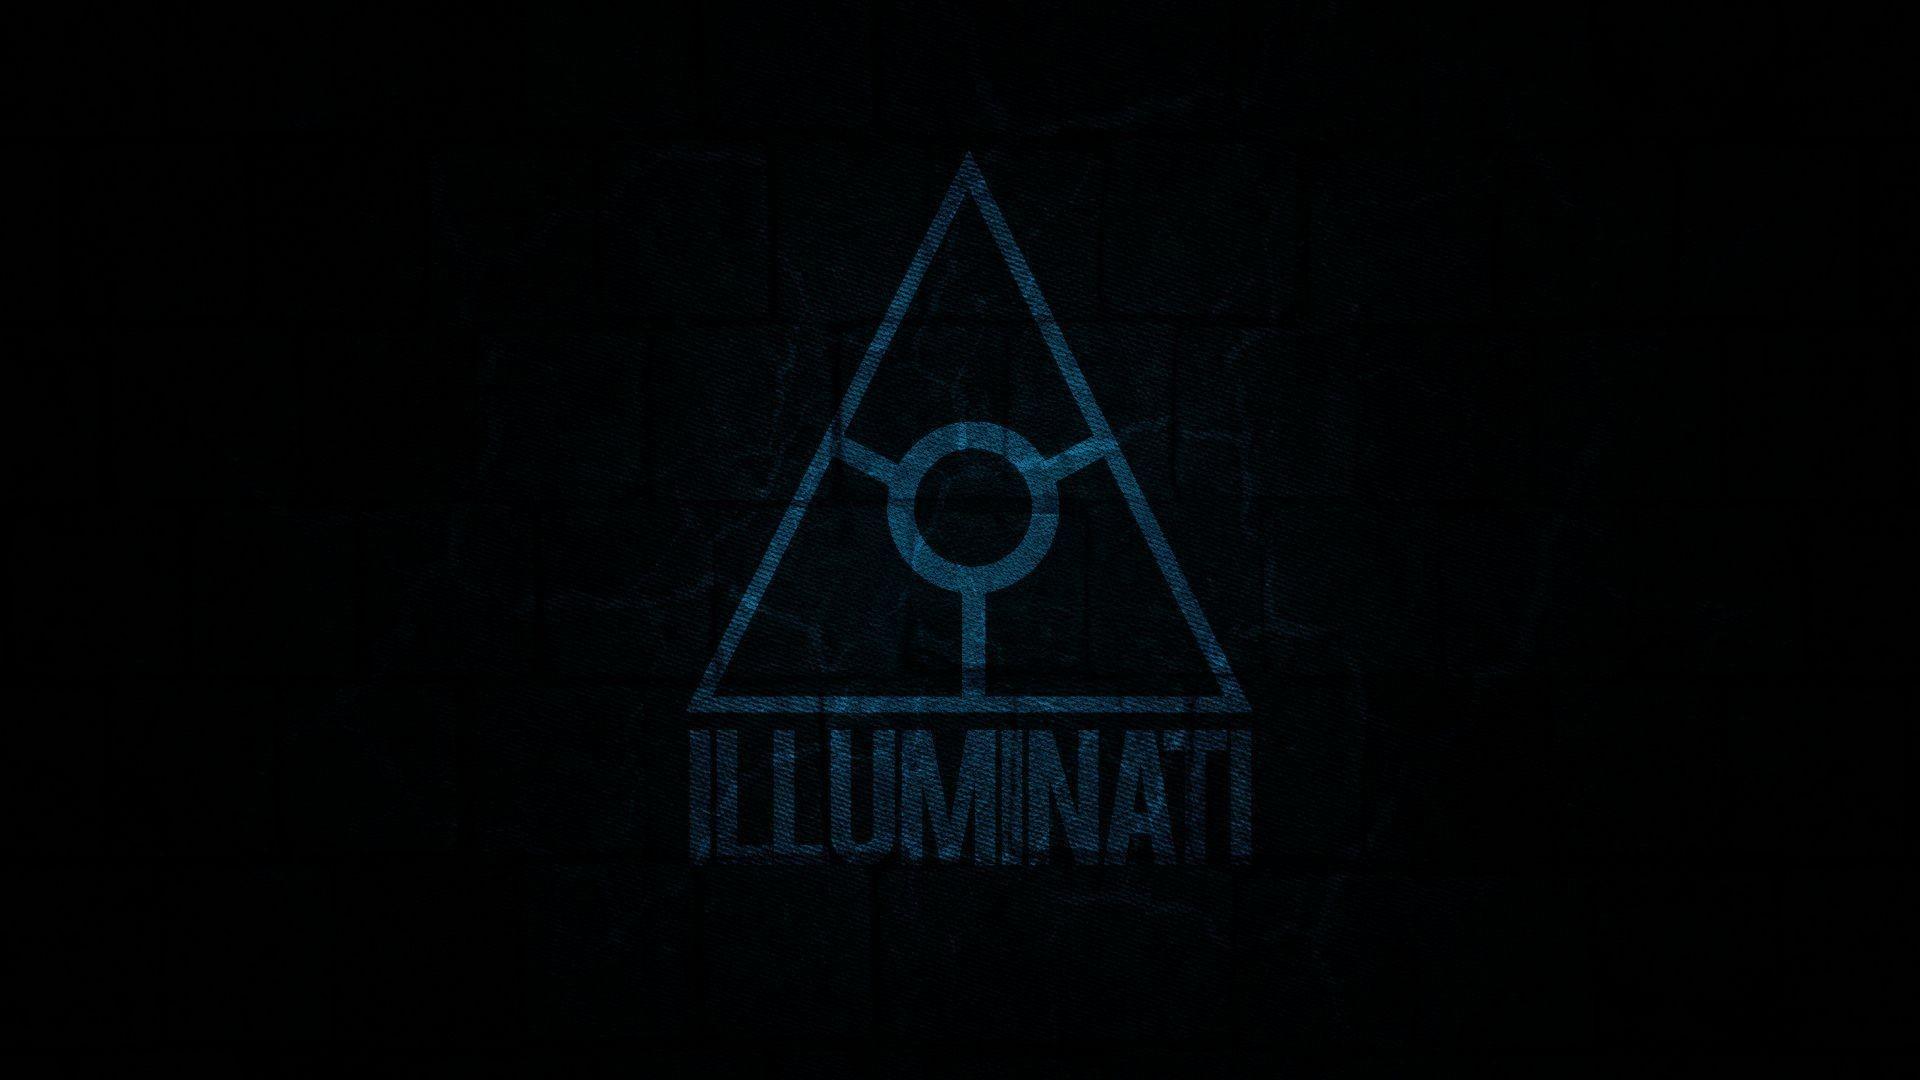 Illuminati wallpaper 1080p 73 images 1920x1080 best michael jordan illuminati wallpaper hd wallpapers of nature full hd 1080p desktop backgrounds voltagebd Image collections